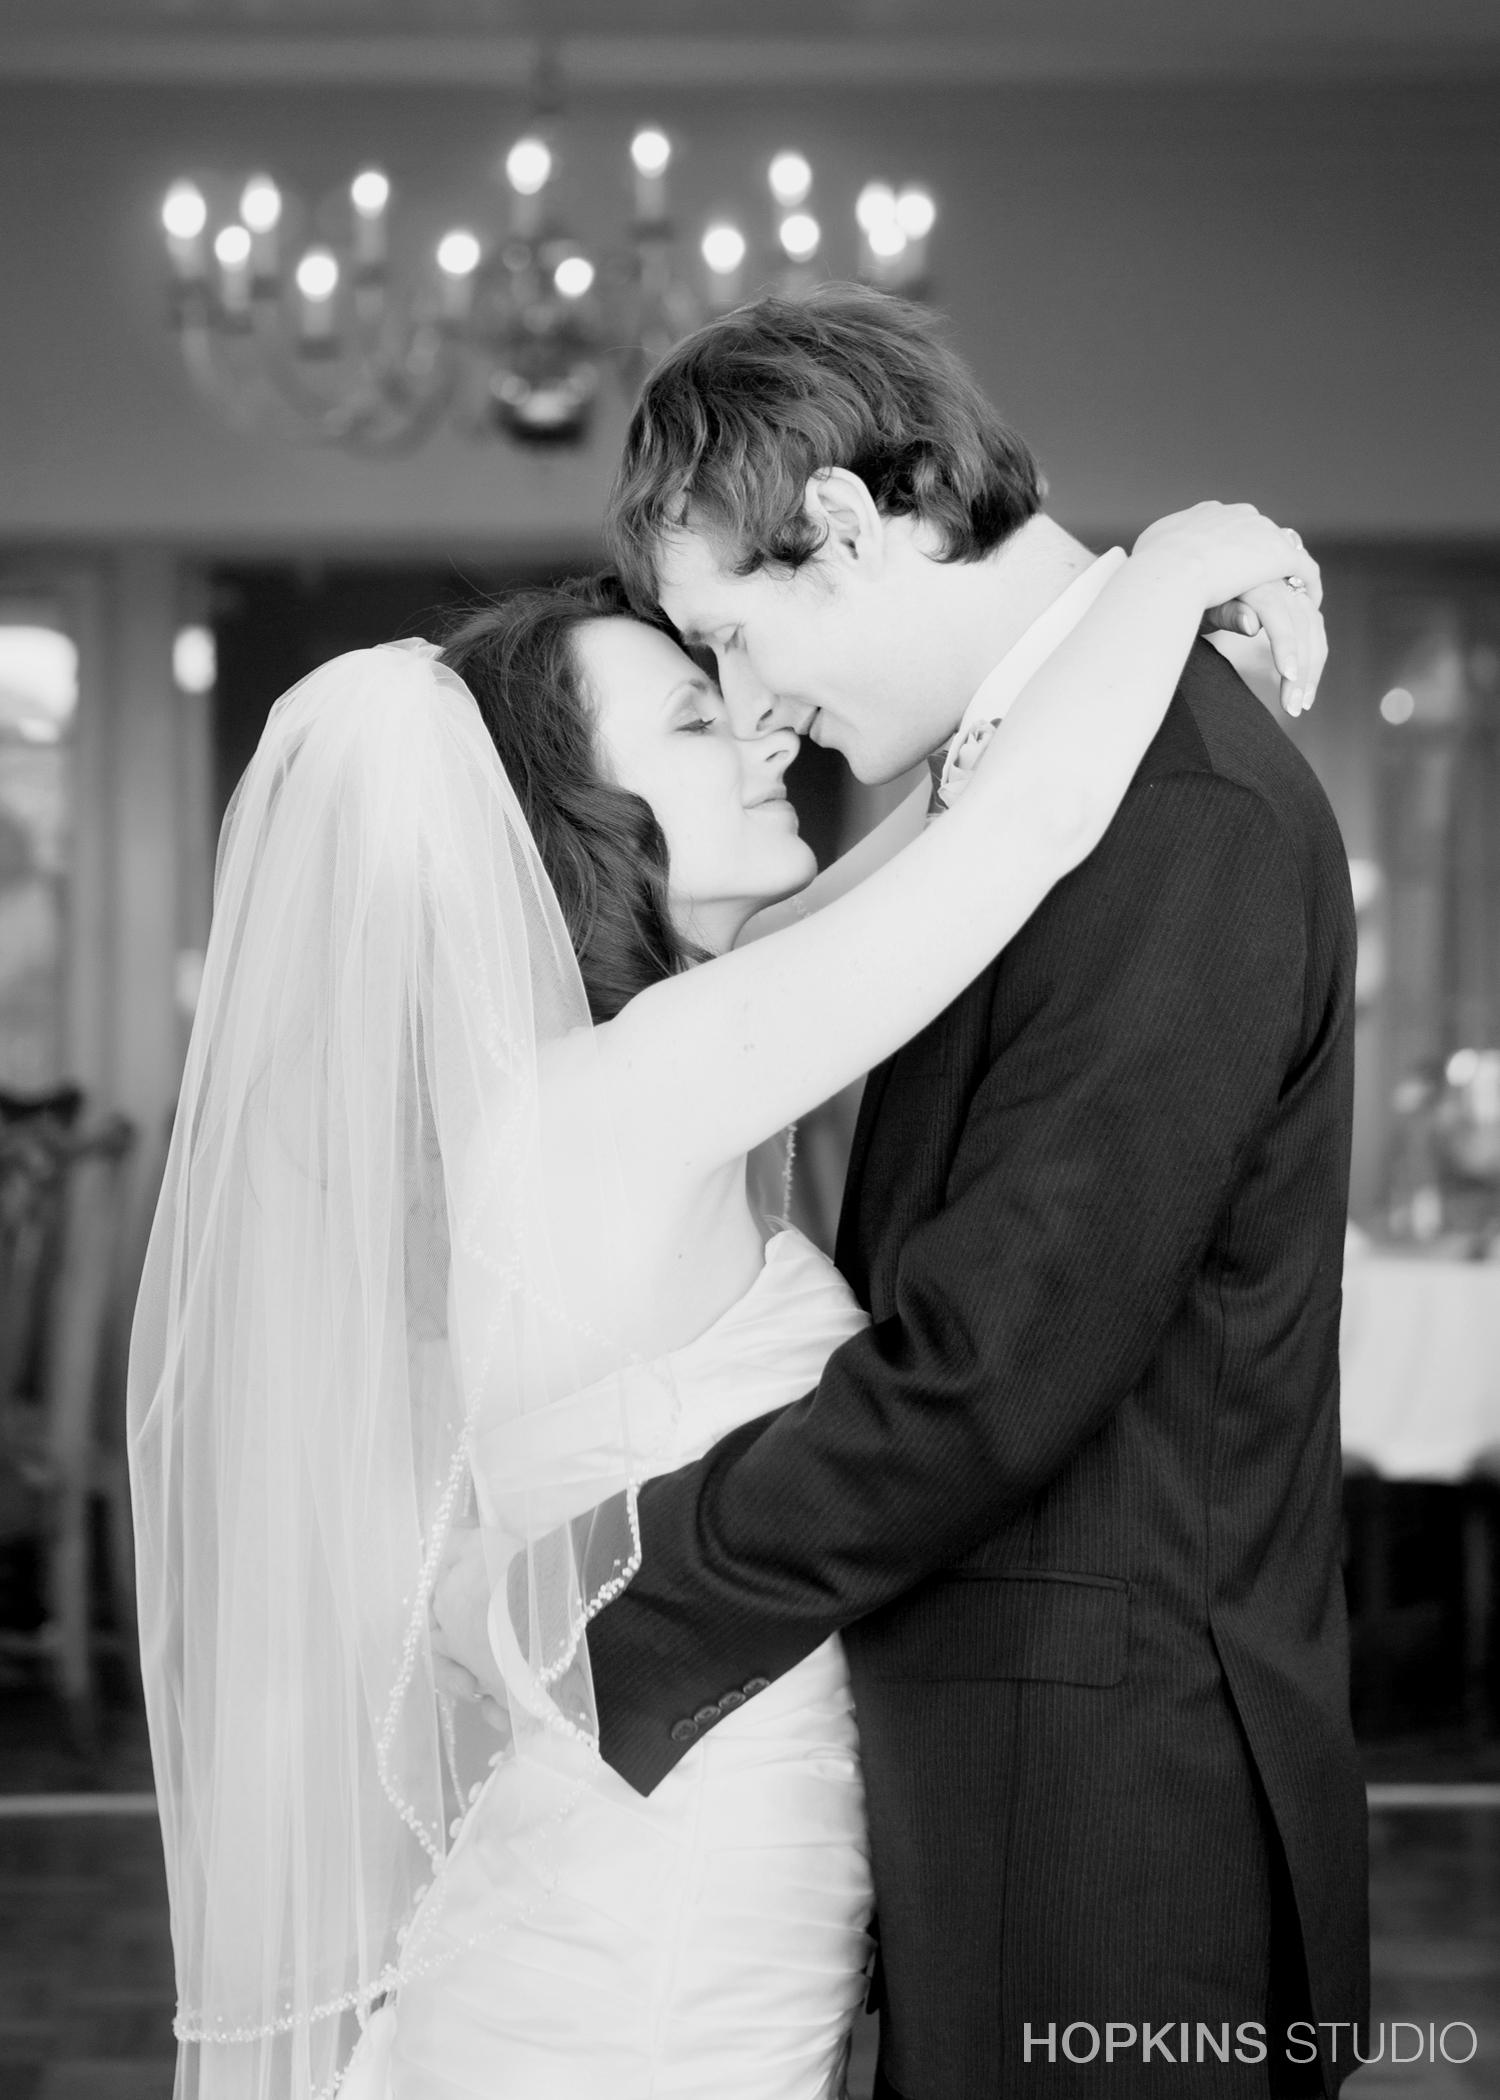 wedding-photography-Berrien-Hills-Golf-Club-Benton-Harbor-Michigan_02.jpg